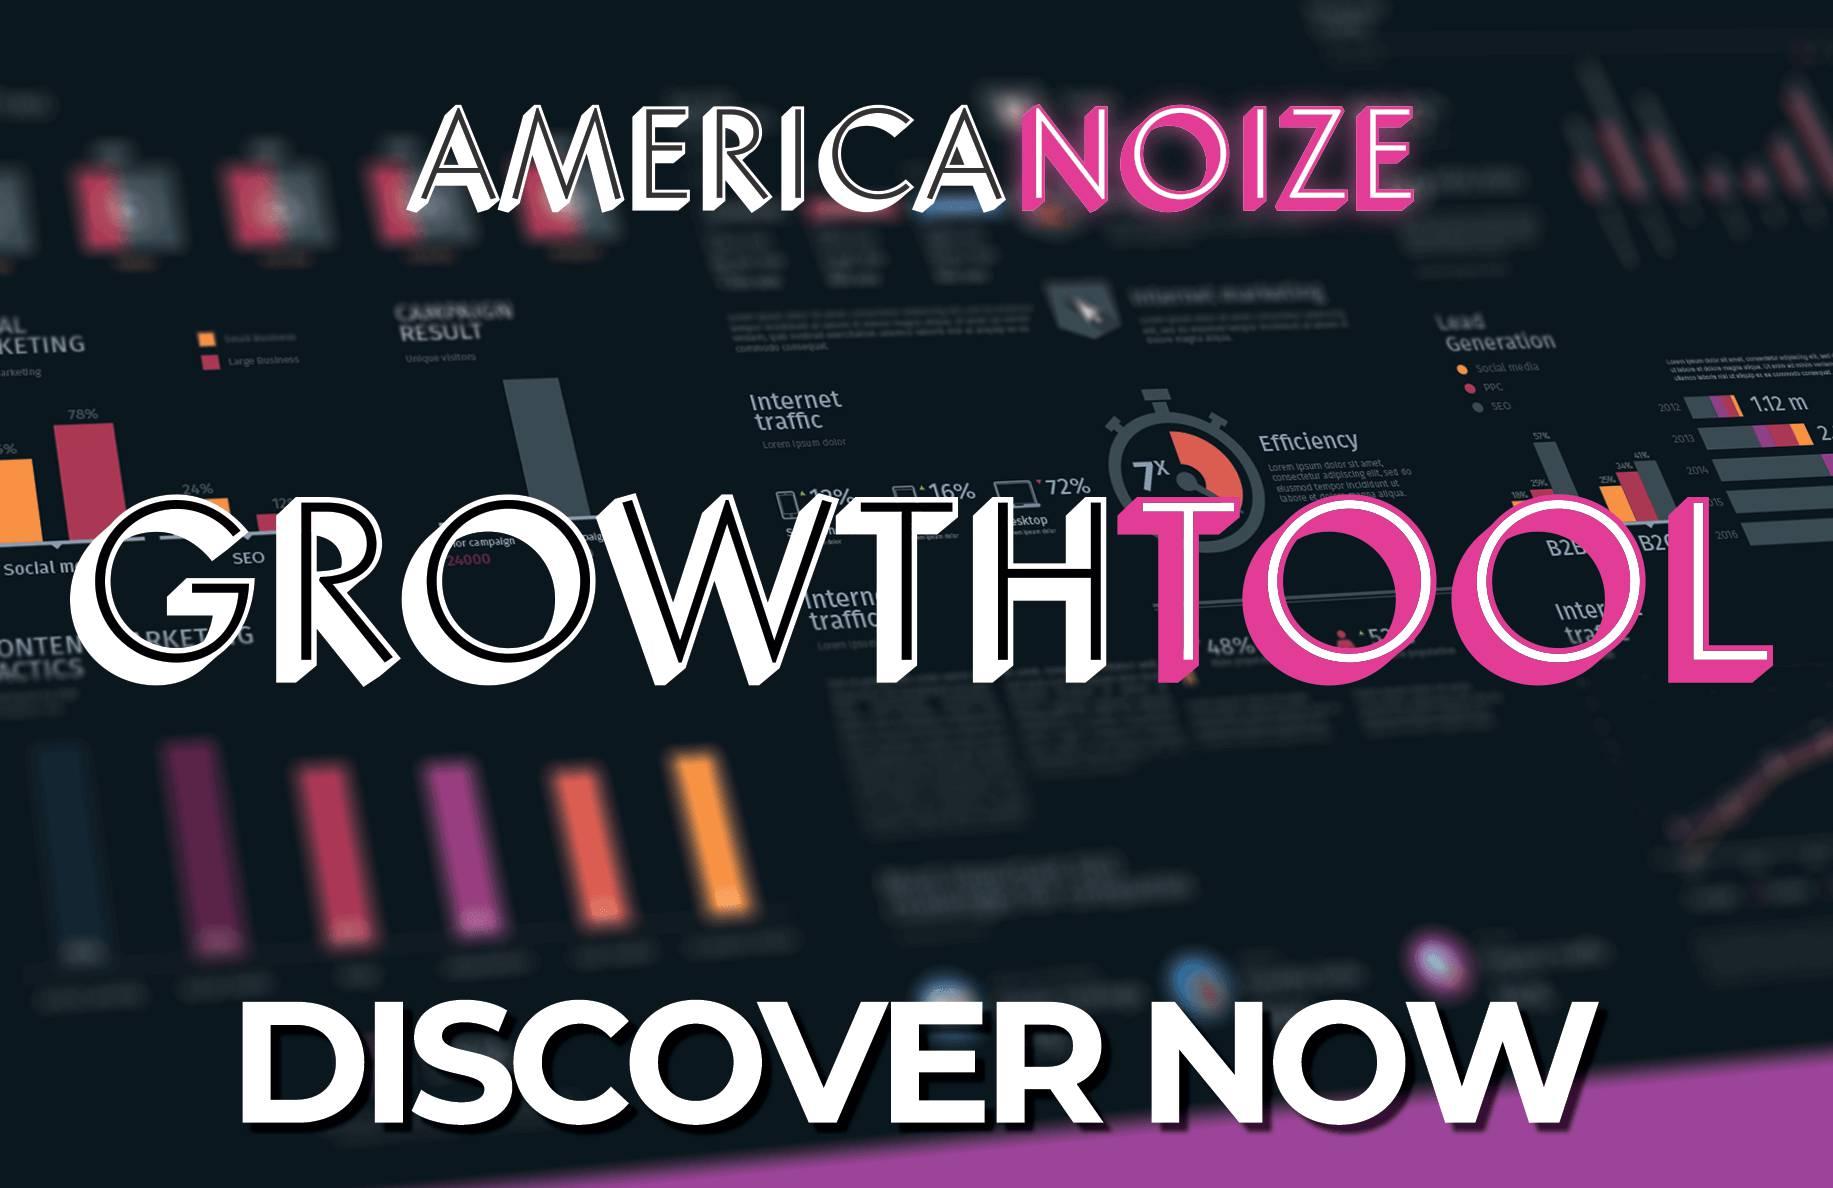 Growth tool